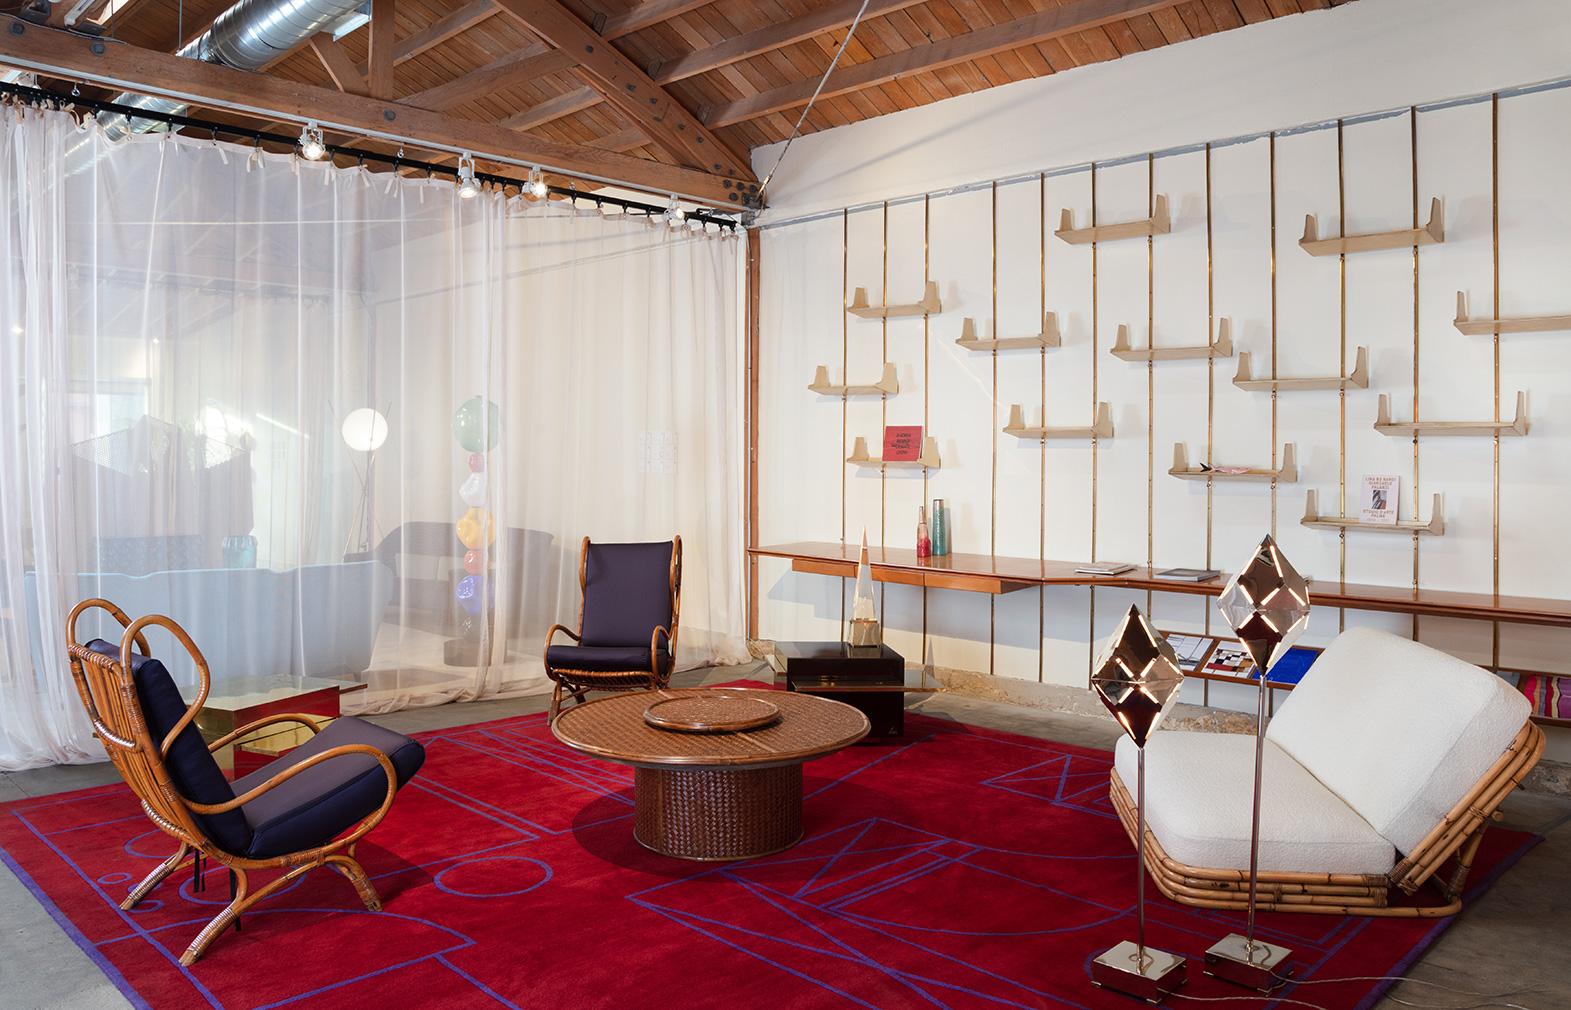 Nilufar Gallery's nomadic SQUAT exhibition pops up in Los Angeles